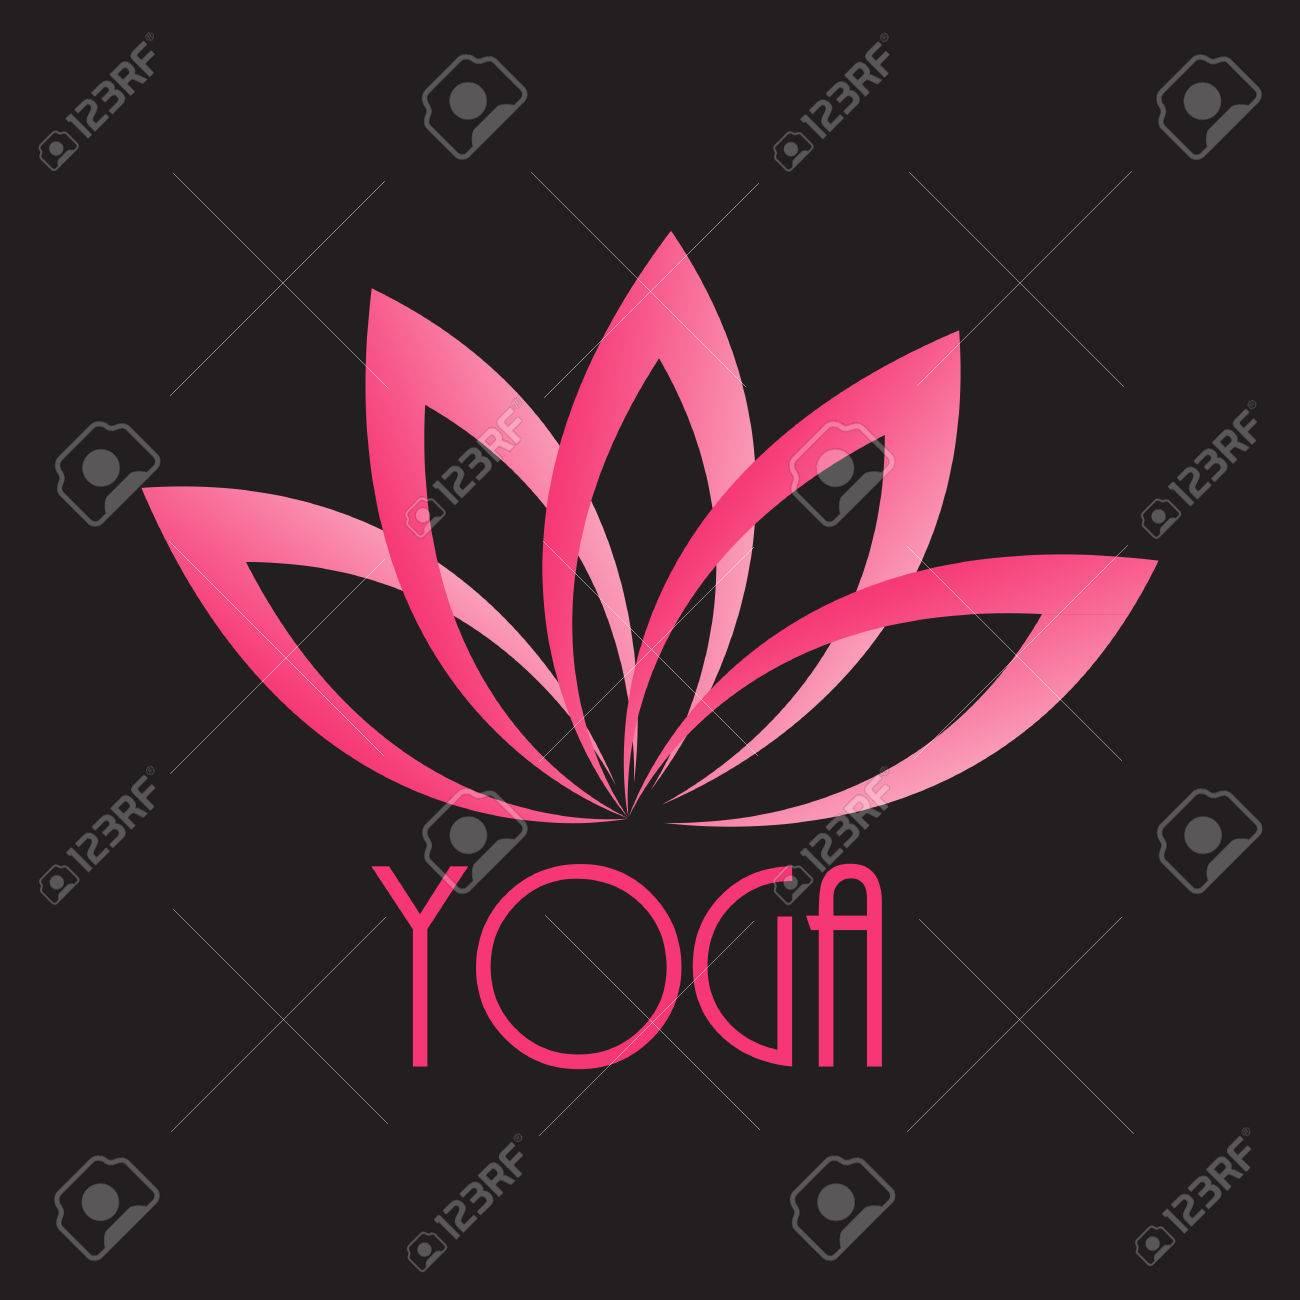 Lotus flower sign for wellness spa and yoga royalty free cliparts lotus flower sign for wellness spa and yoga stock vector 42650842 izmirmasajfo